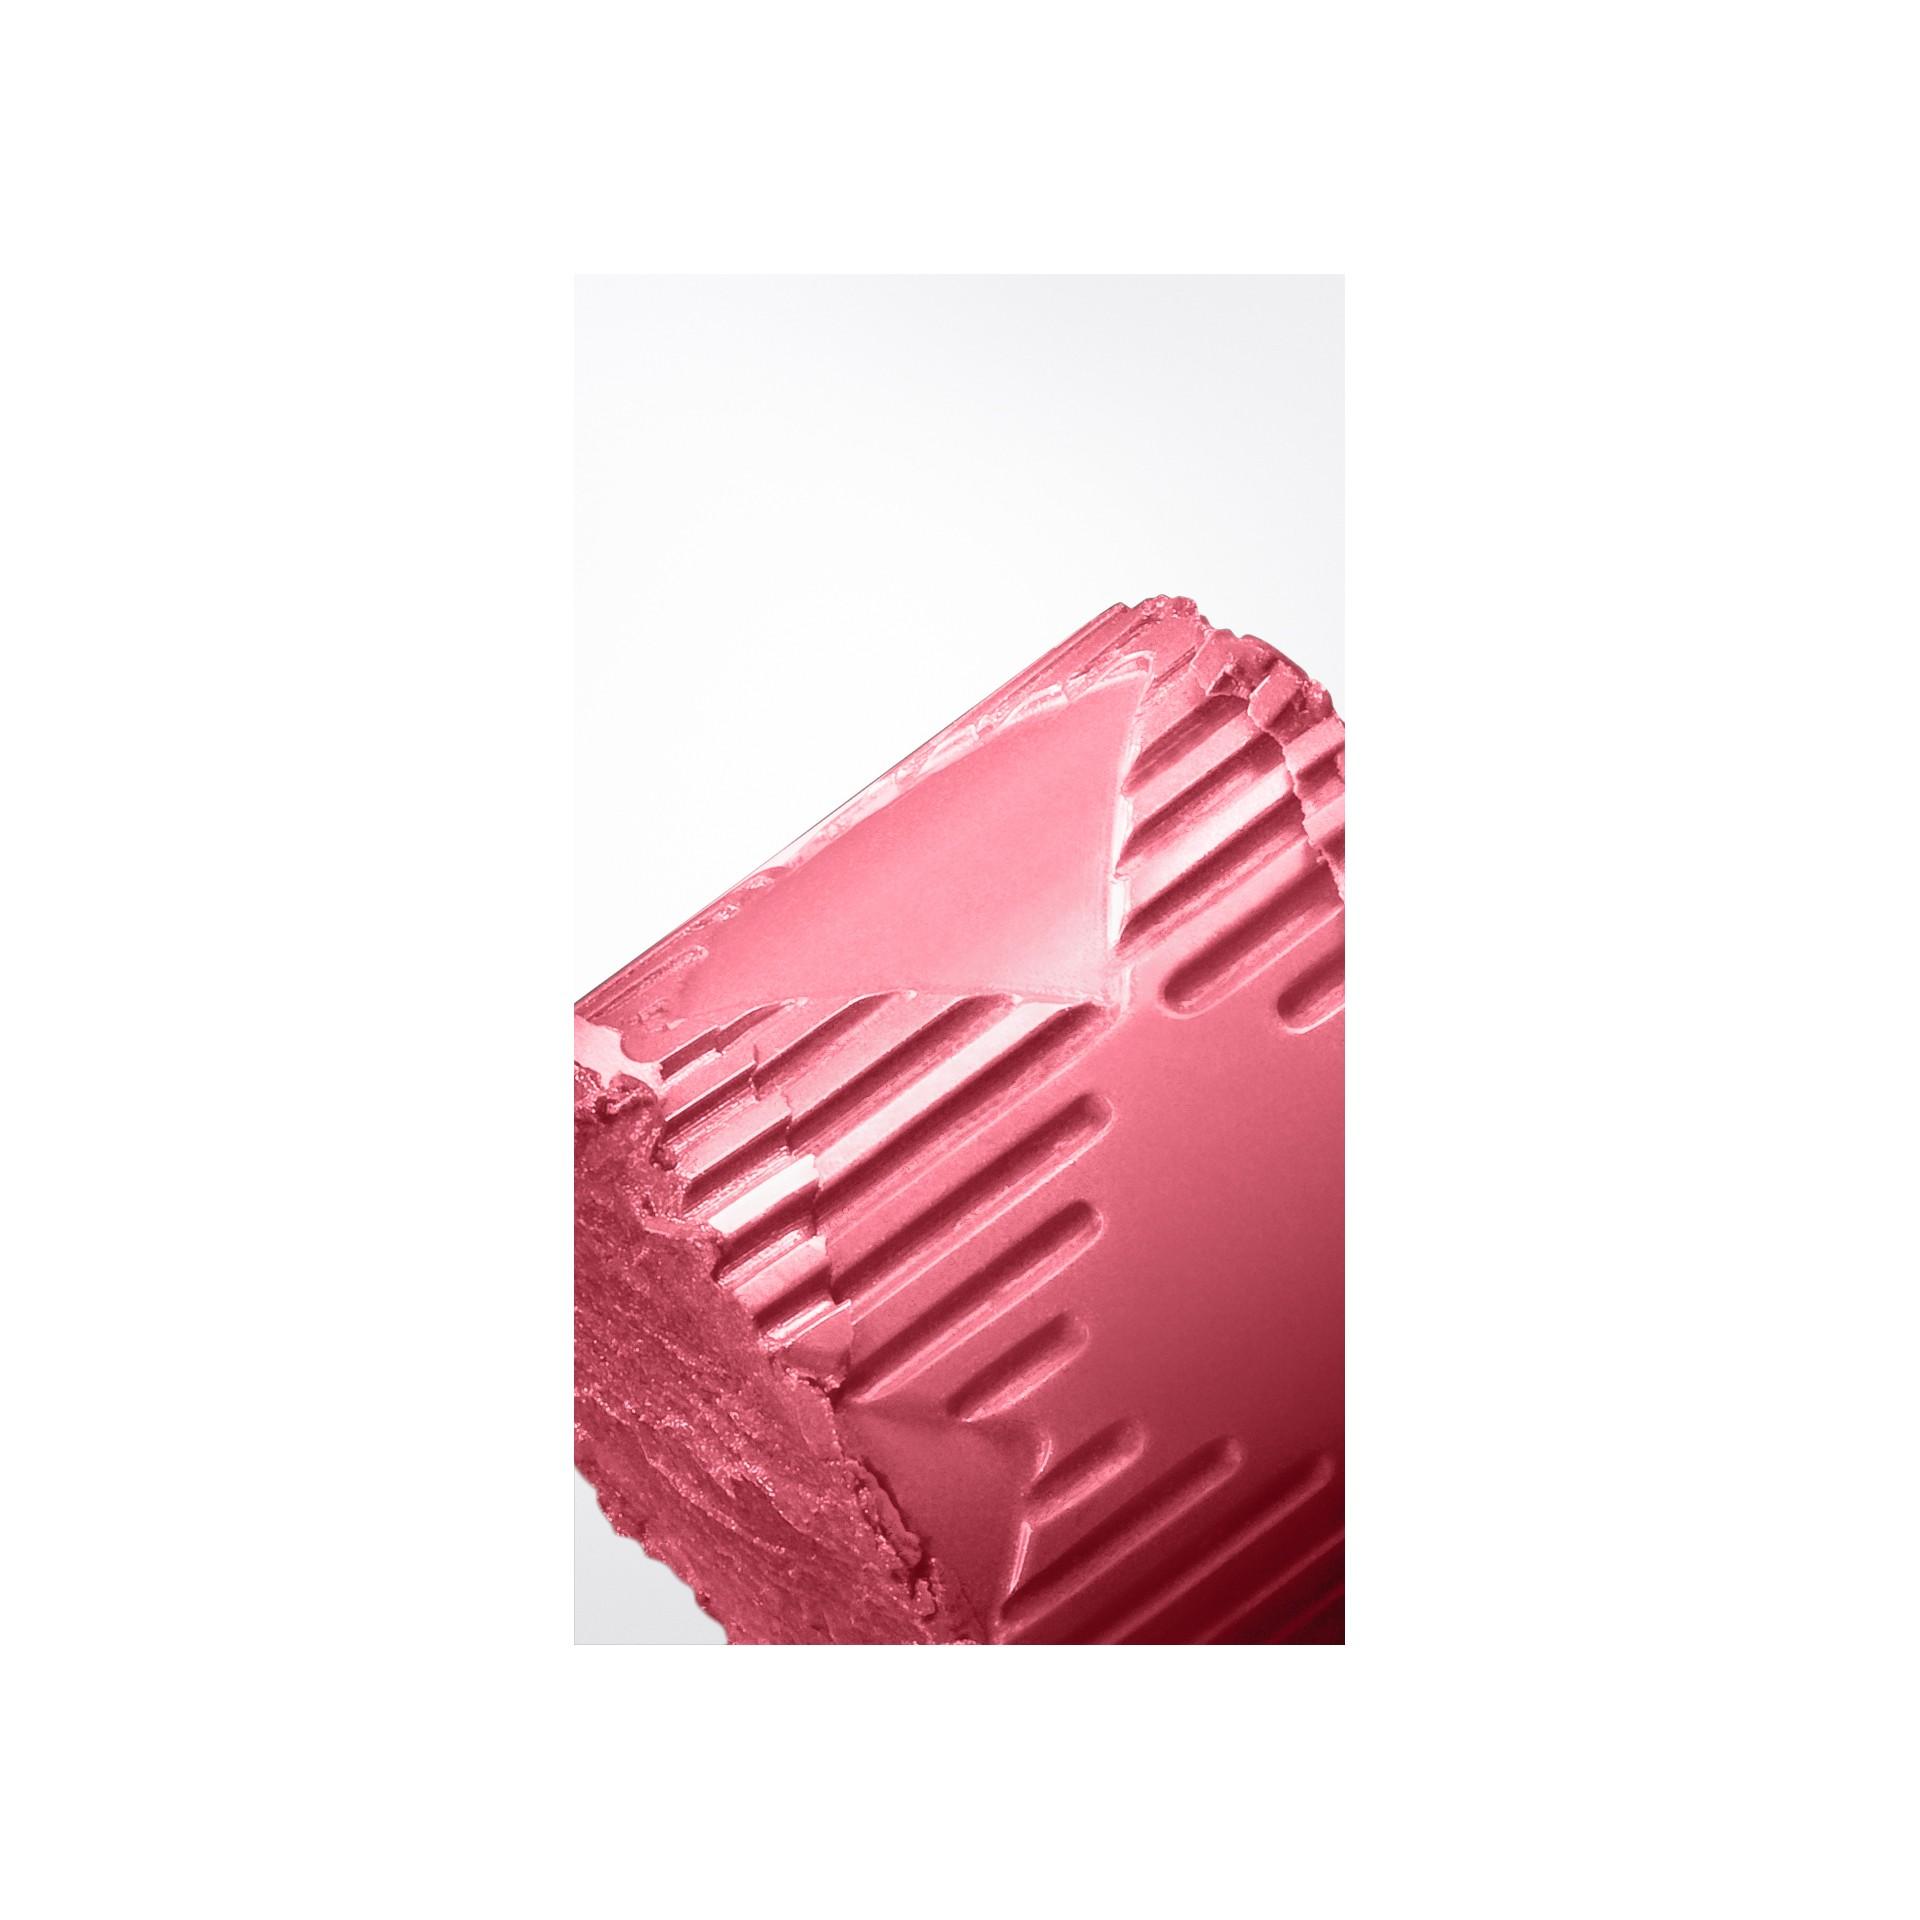 Camellia pink 207 Lip Mist - Camellia Pink No.207 - gallery image 2